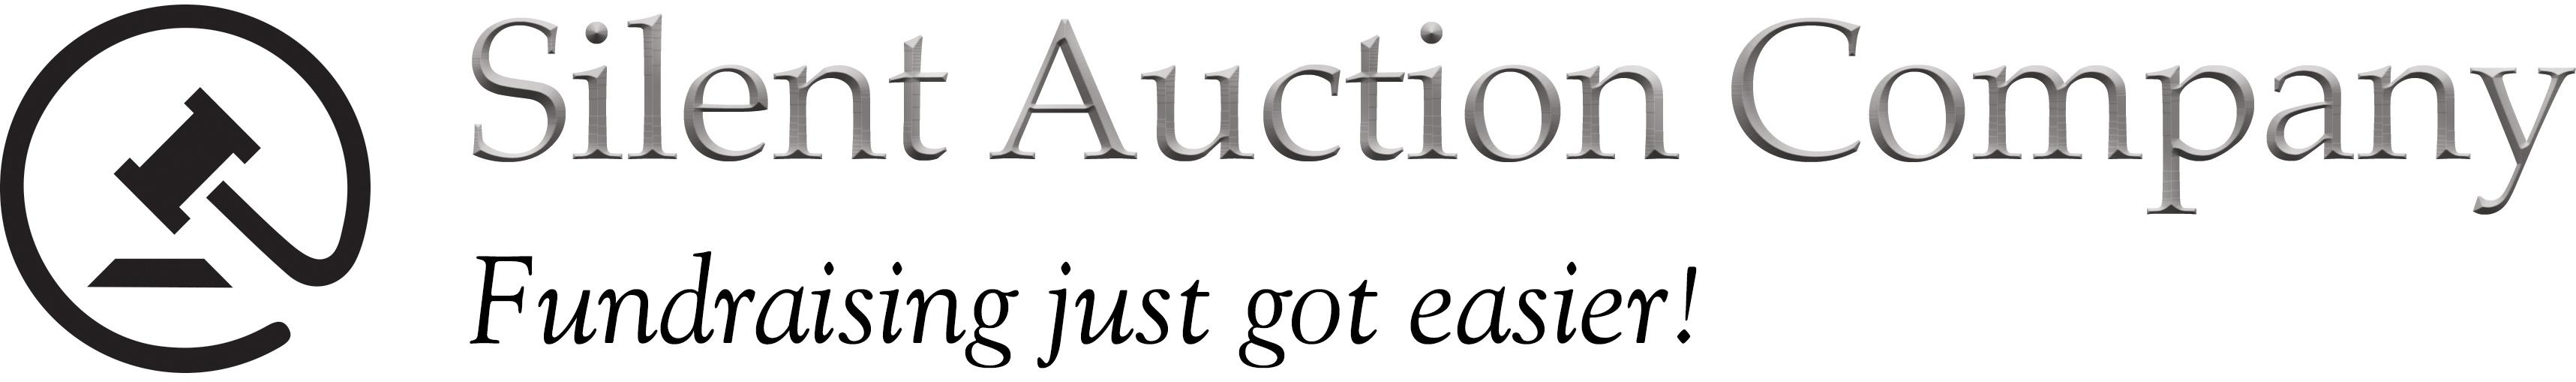 Silent Auction Company